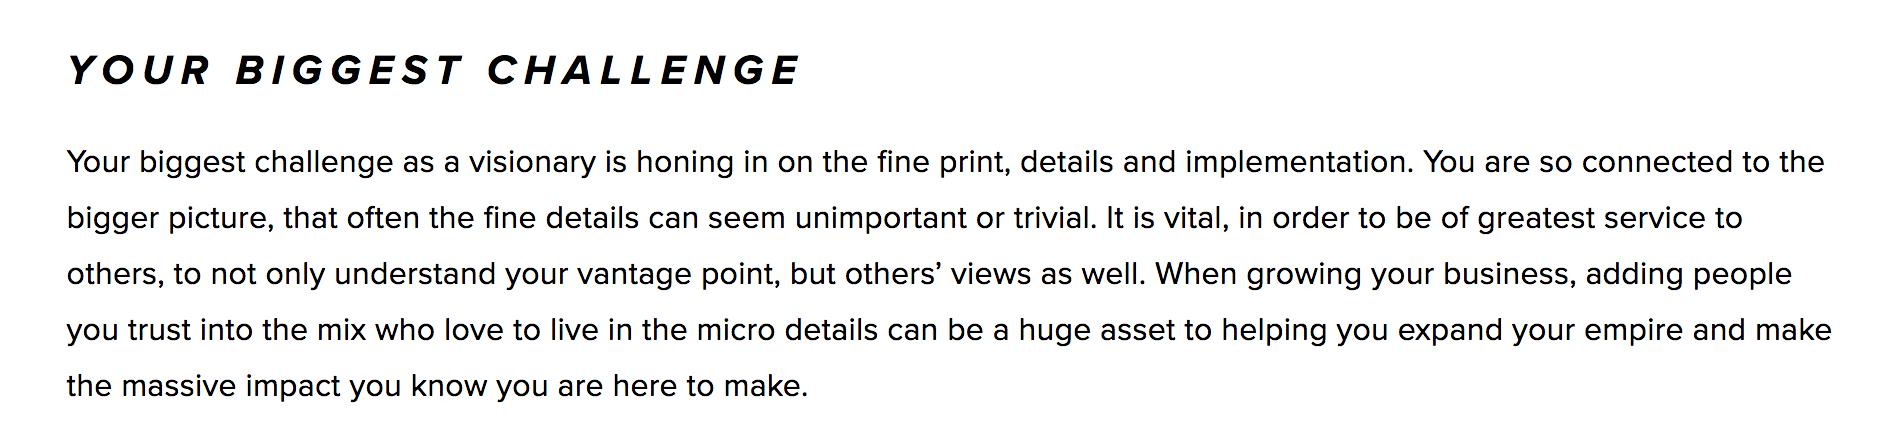 description of challenge visionary faces